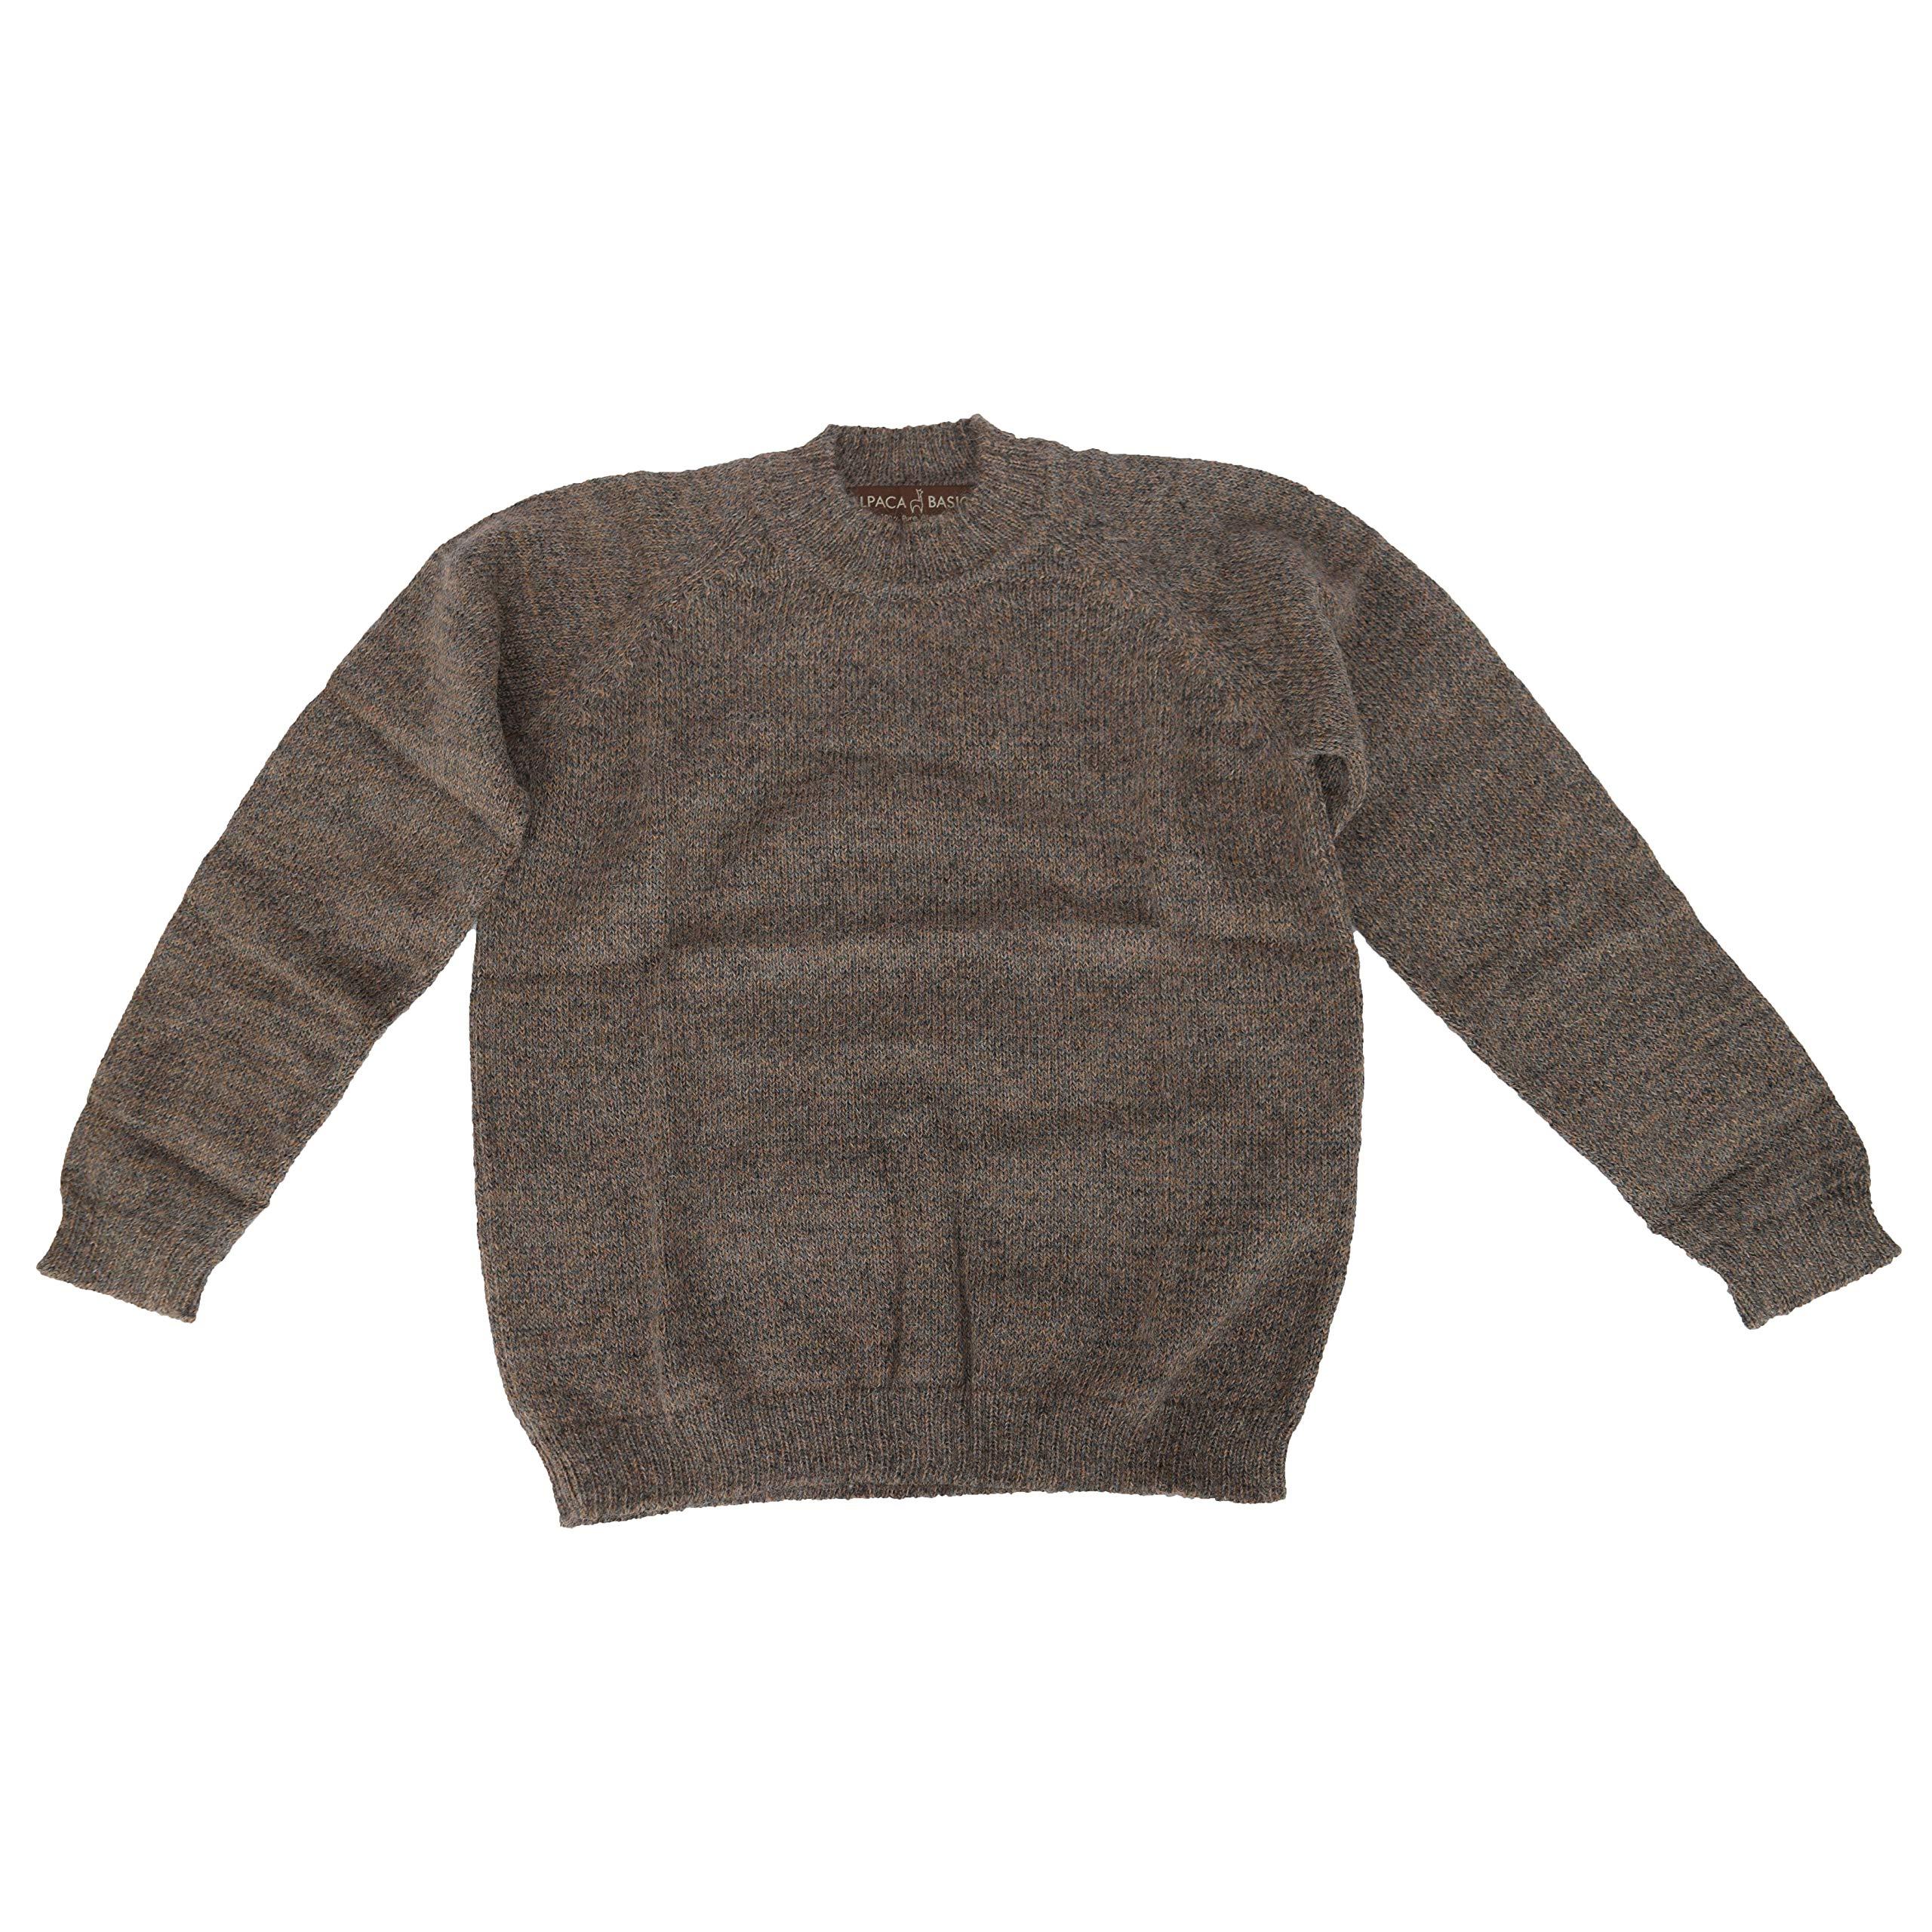 Alpaca Basics Boys Handmade 100% Alpaca Wool Crew Neck Sweater (Taupe, 14)